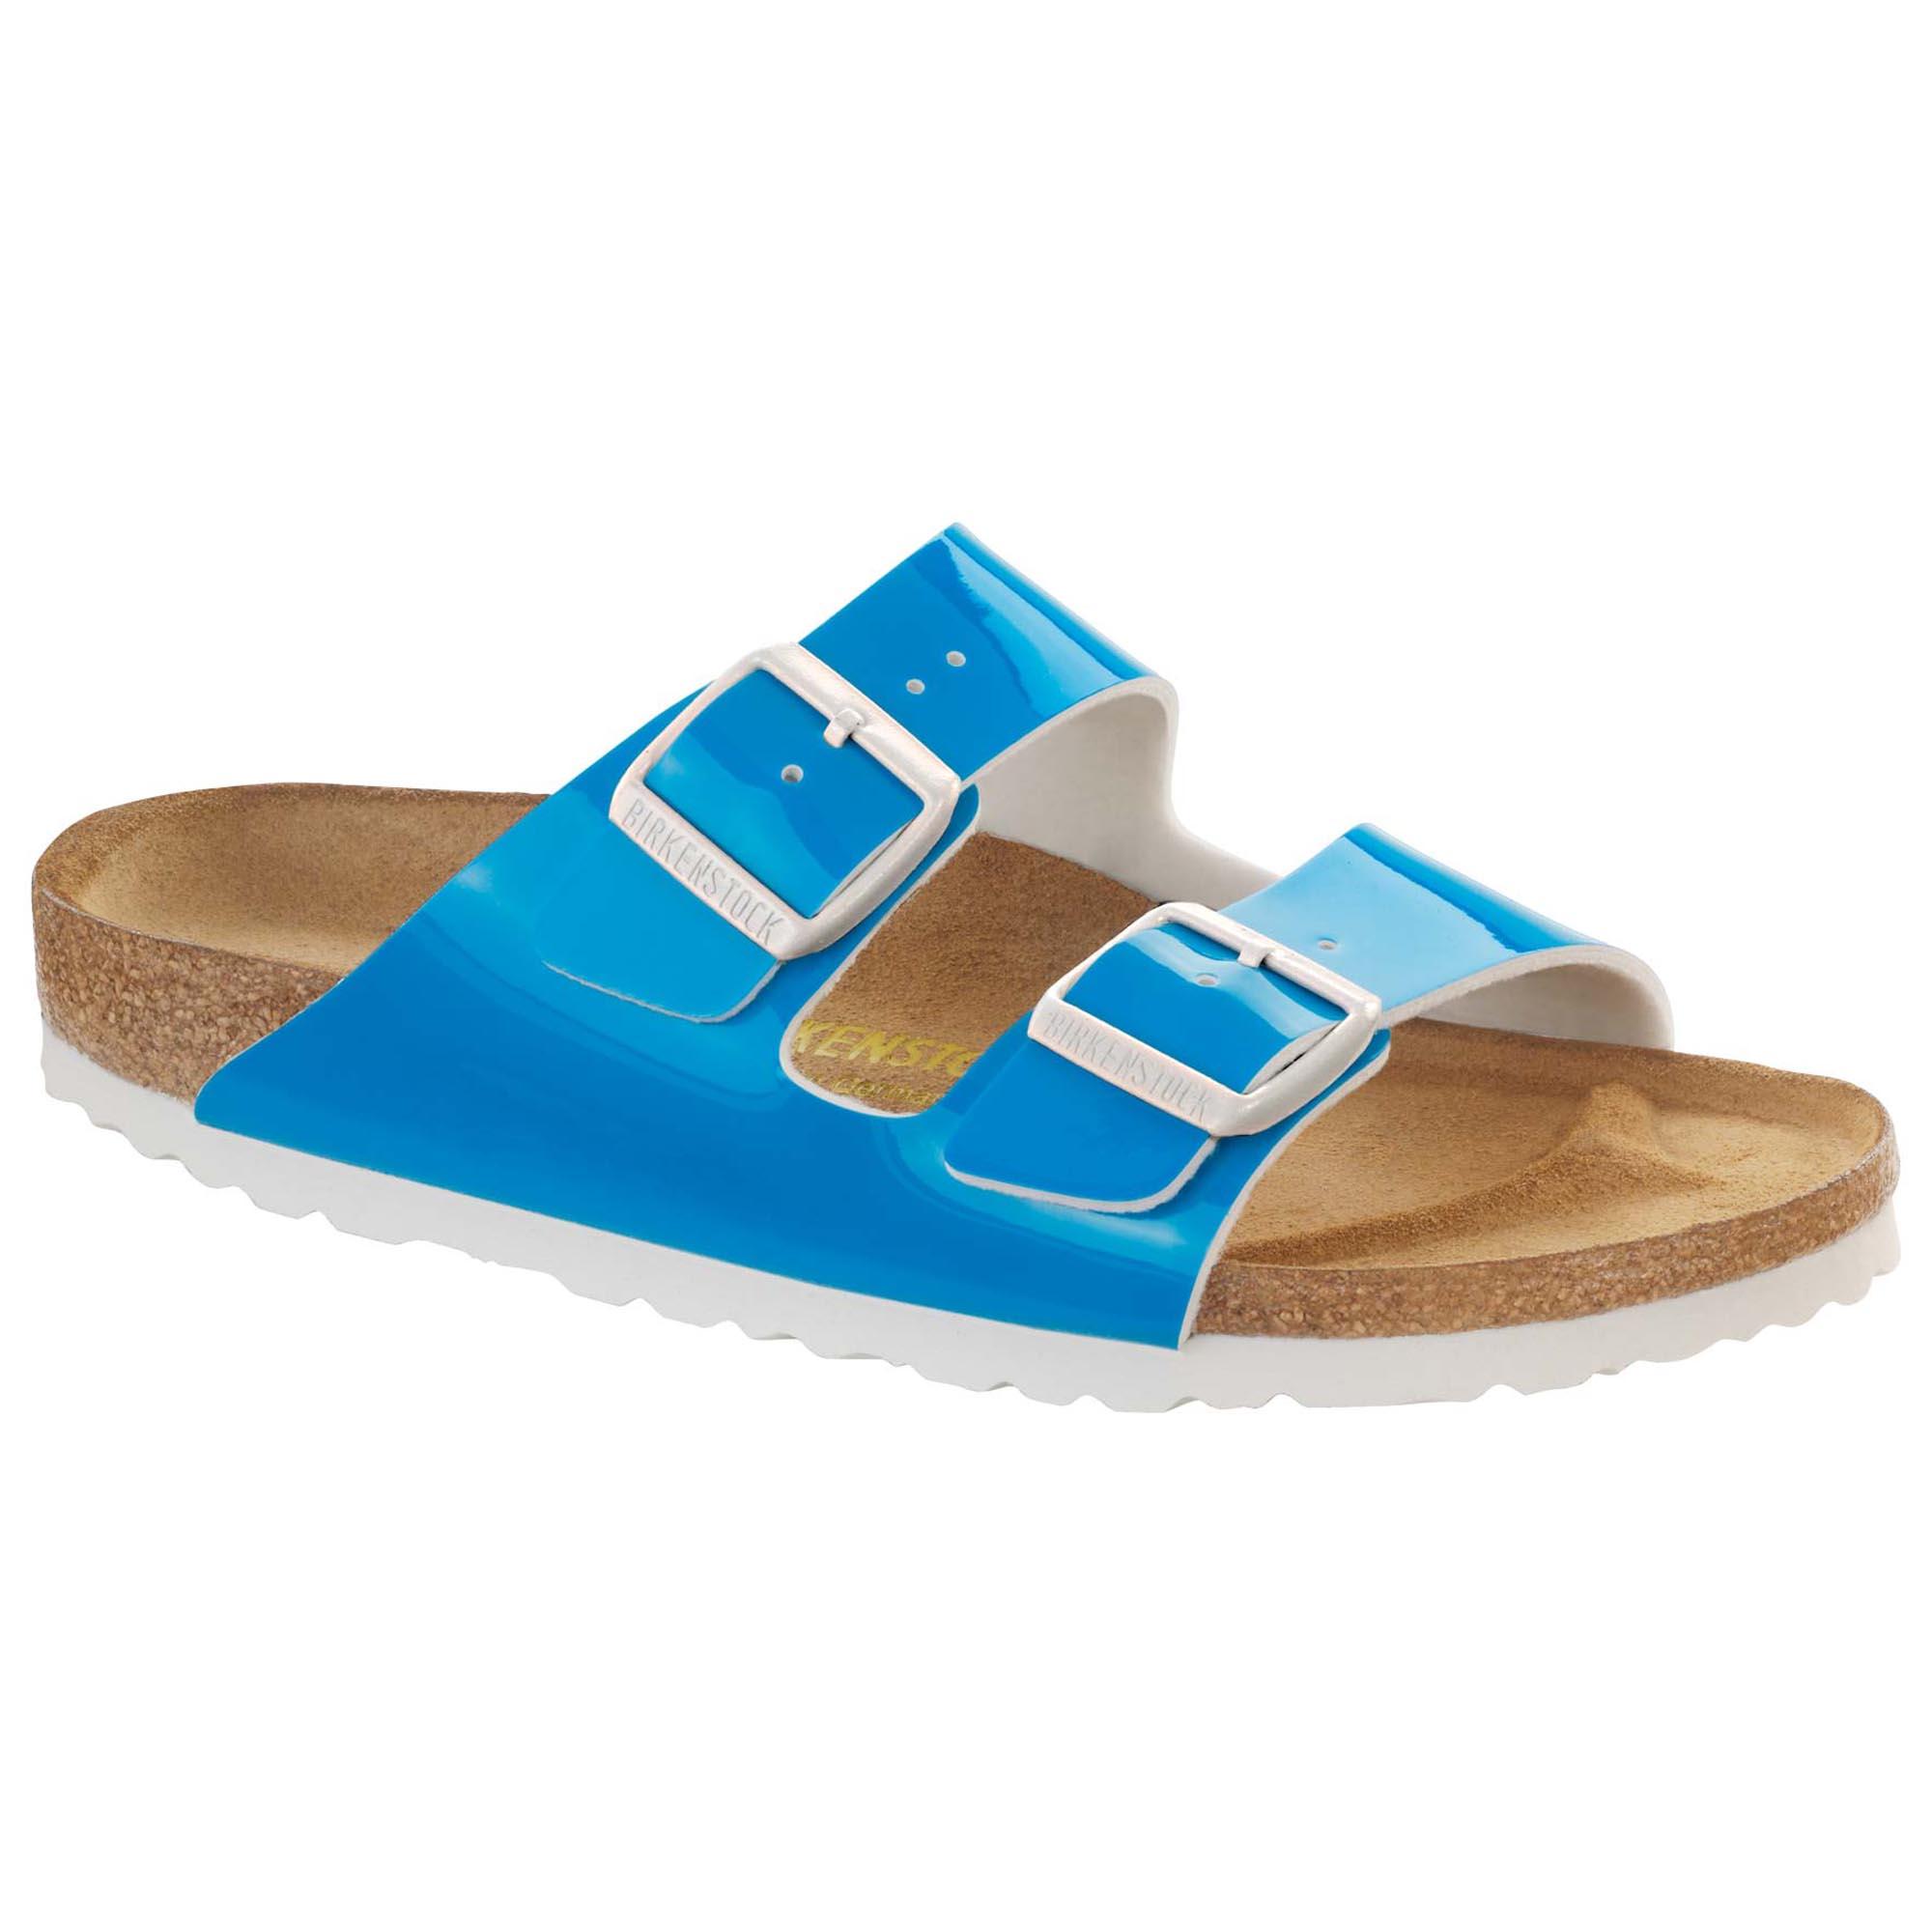 Arizona Birko-Flor Patent Neon Blue